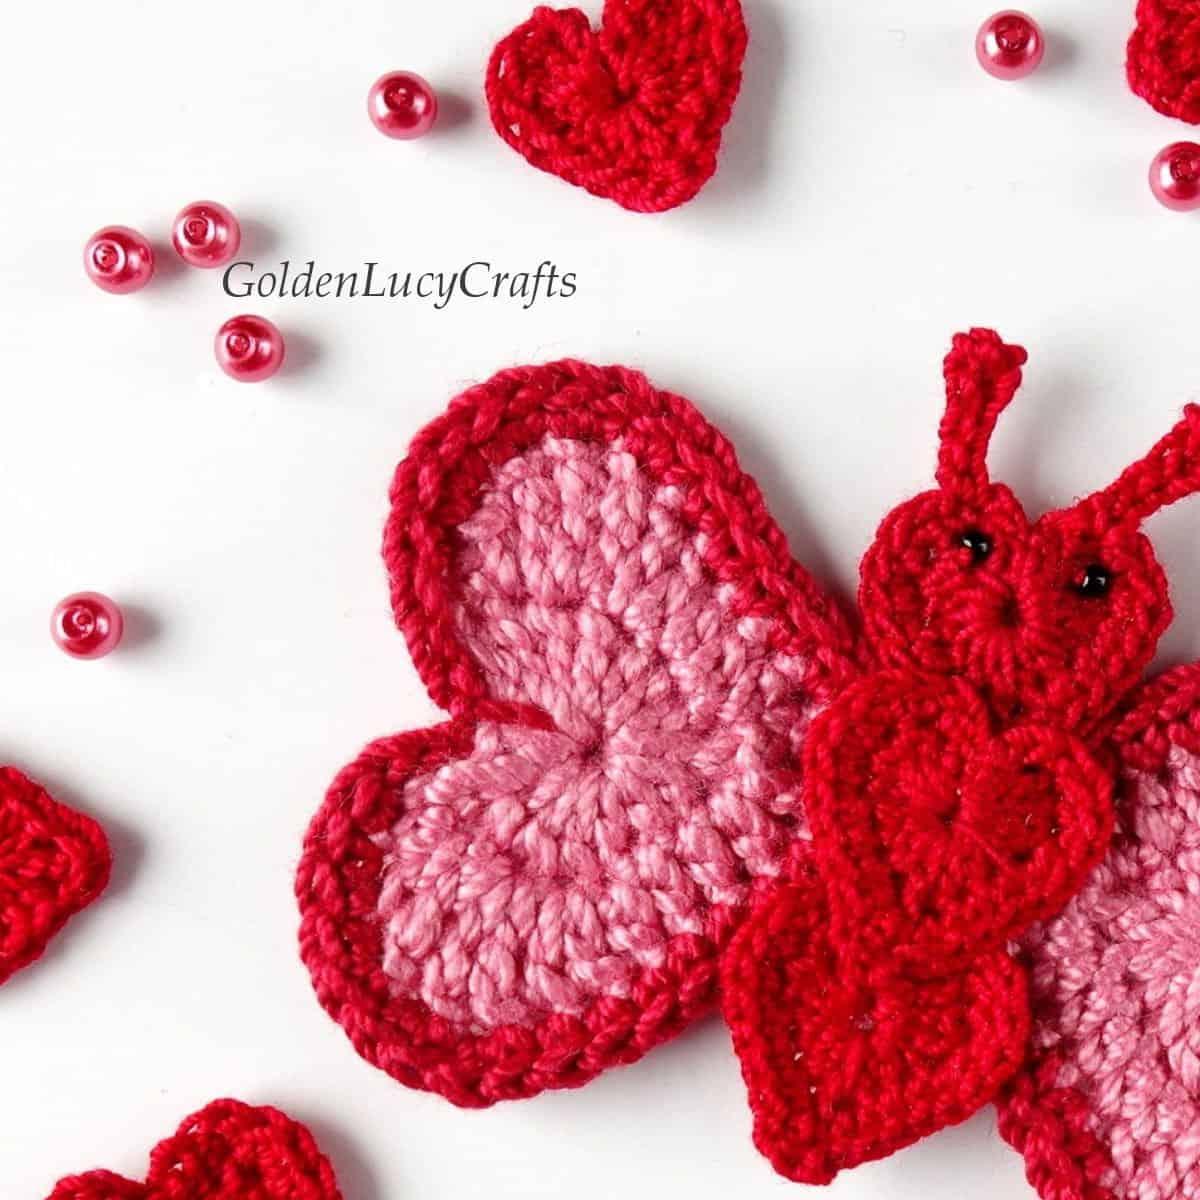 Crochet butterfly applique close up image.